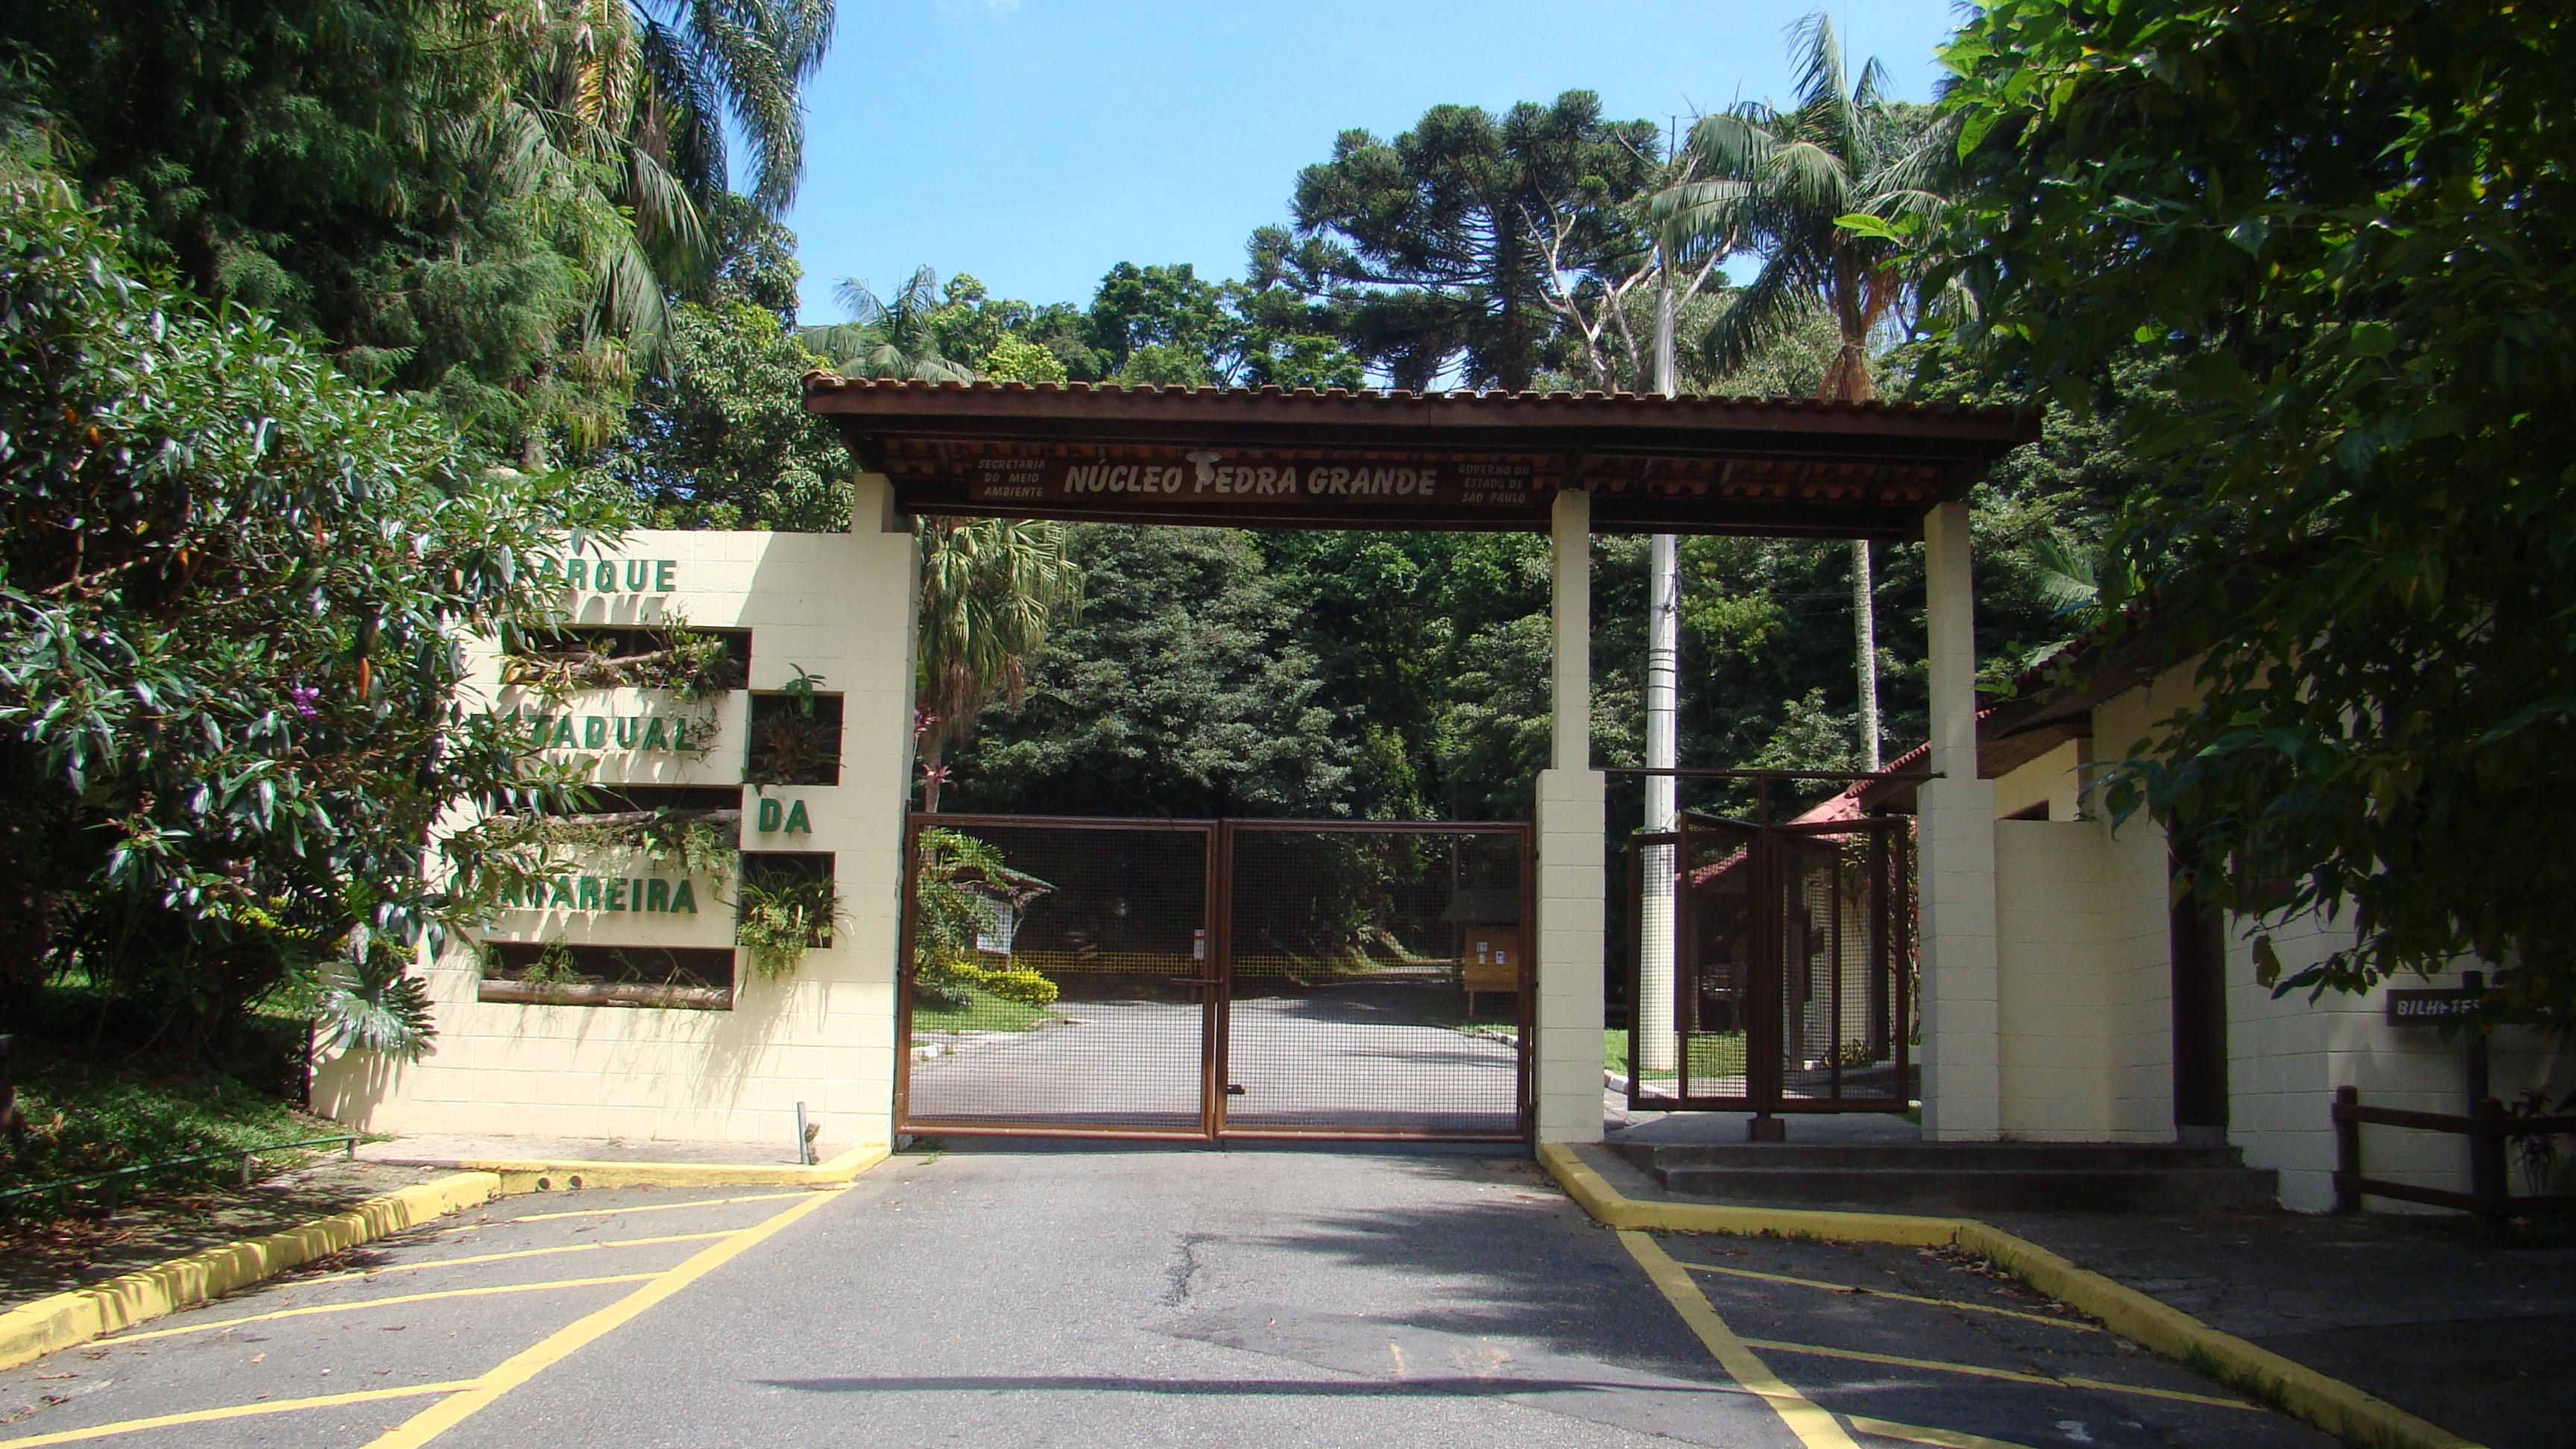 PE Cantareira Pedra Grande - portal